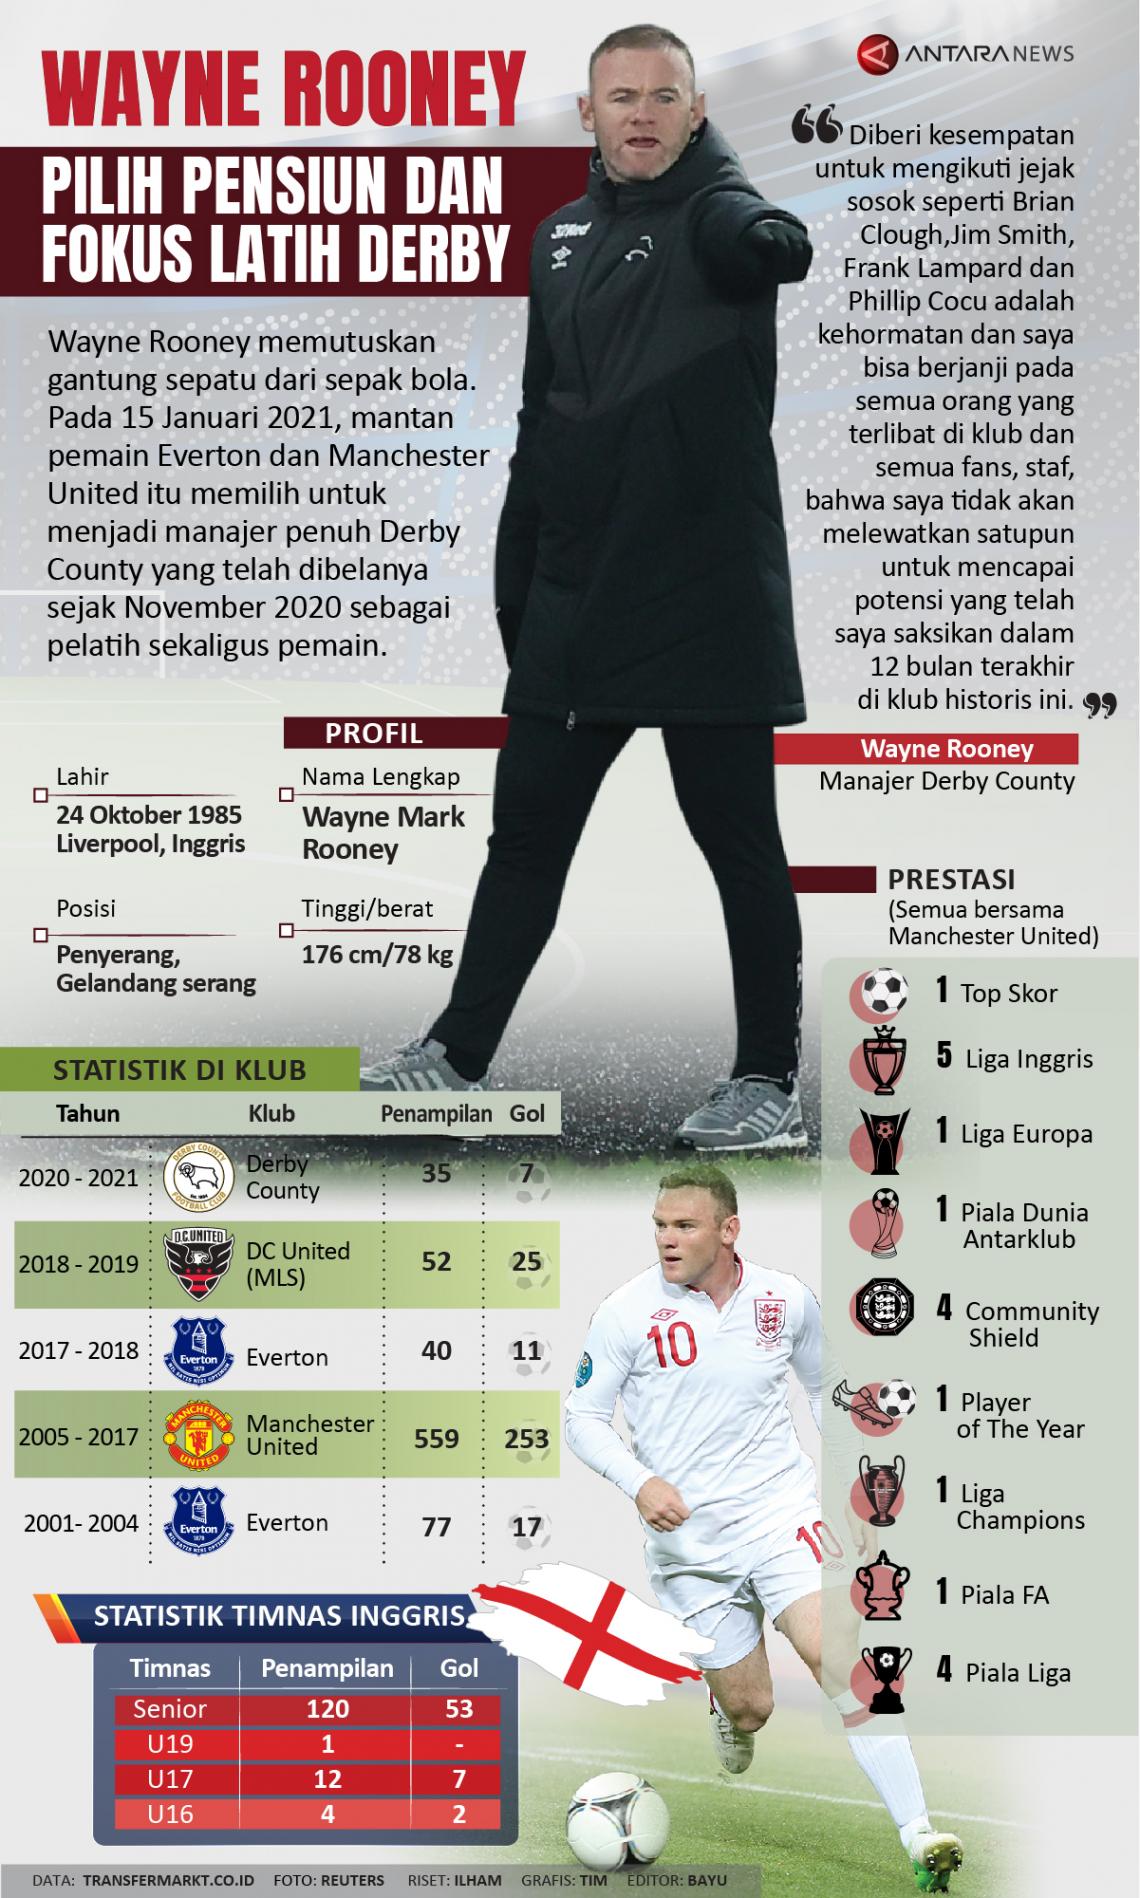 Wayne Rooney pilih pensiun dan fokus latih Derby